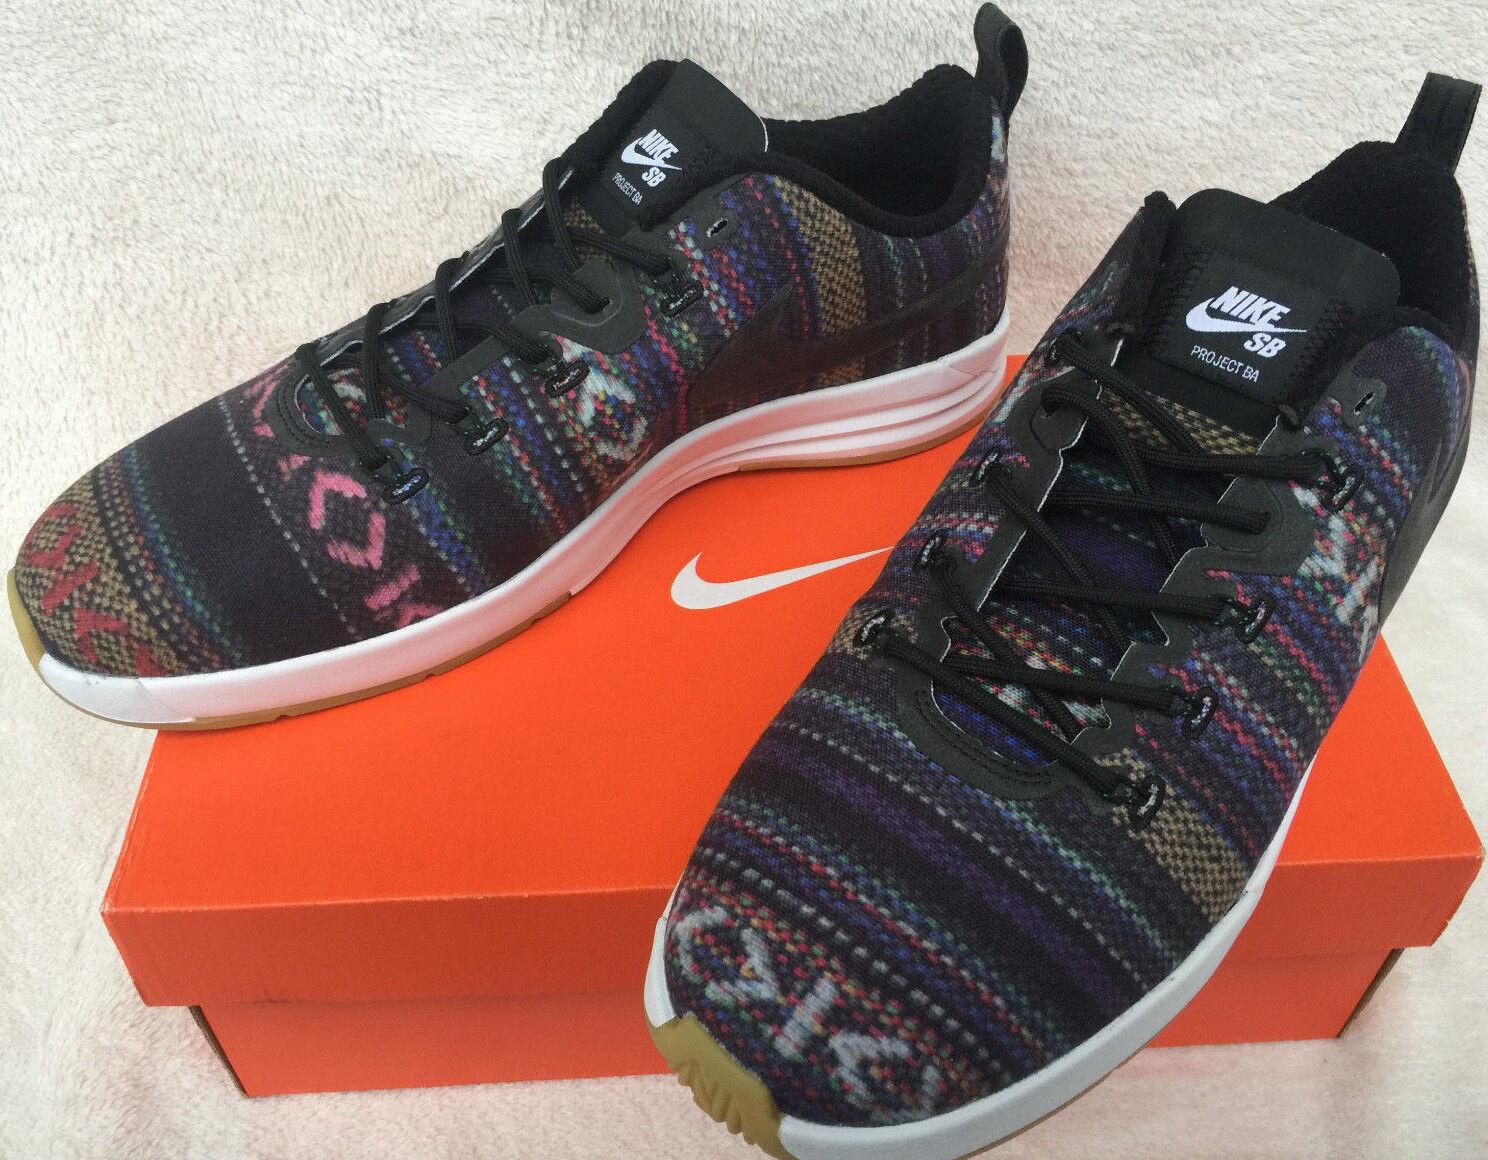 Nike sb - projekt r / r männer. 654892-902 hackey sack packen skateboard - schuhe für männer. r c5cb36